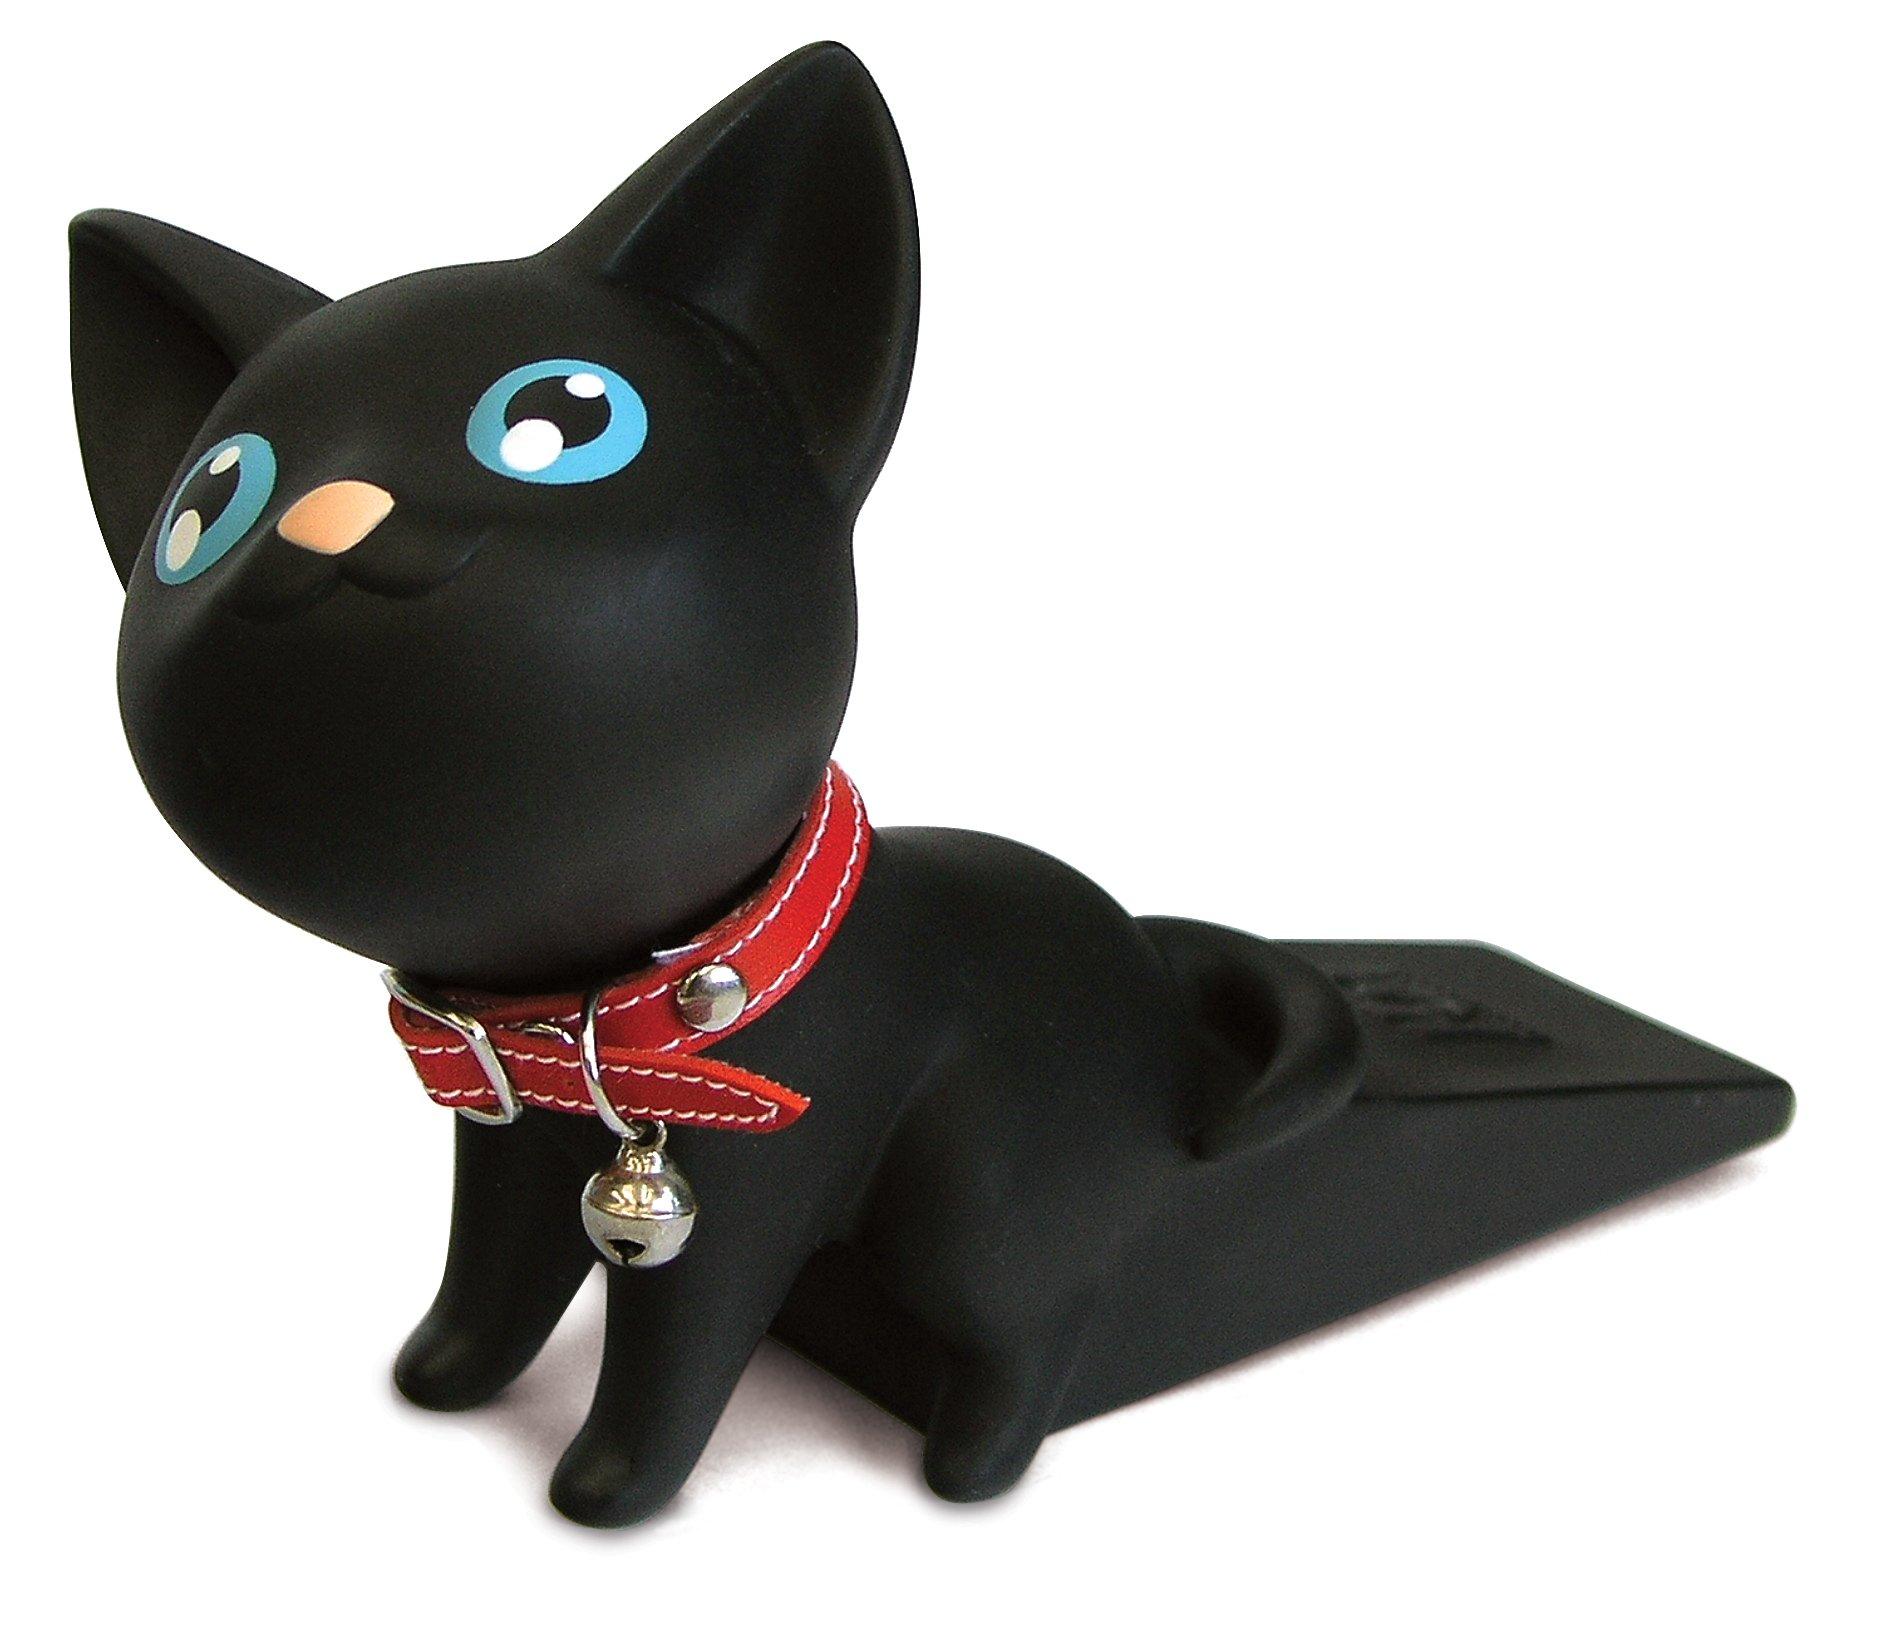 Witty Novelty Black Kitty Doorstop